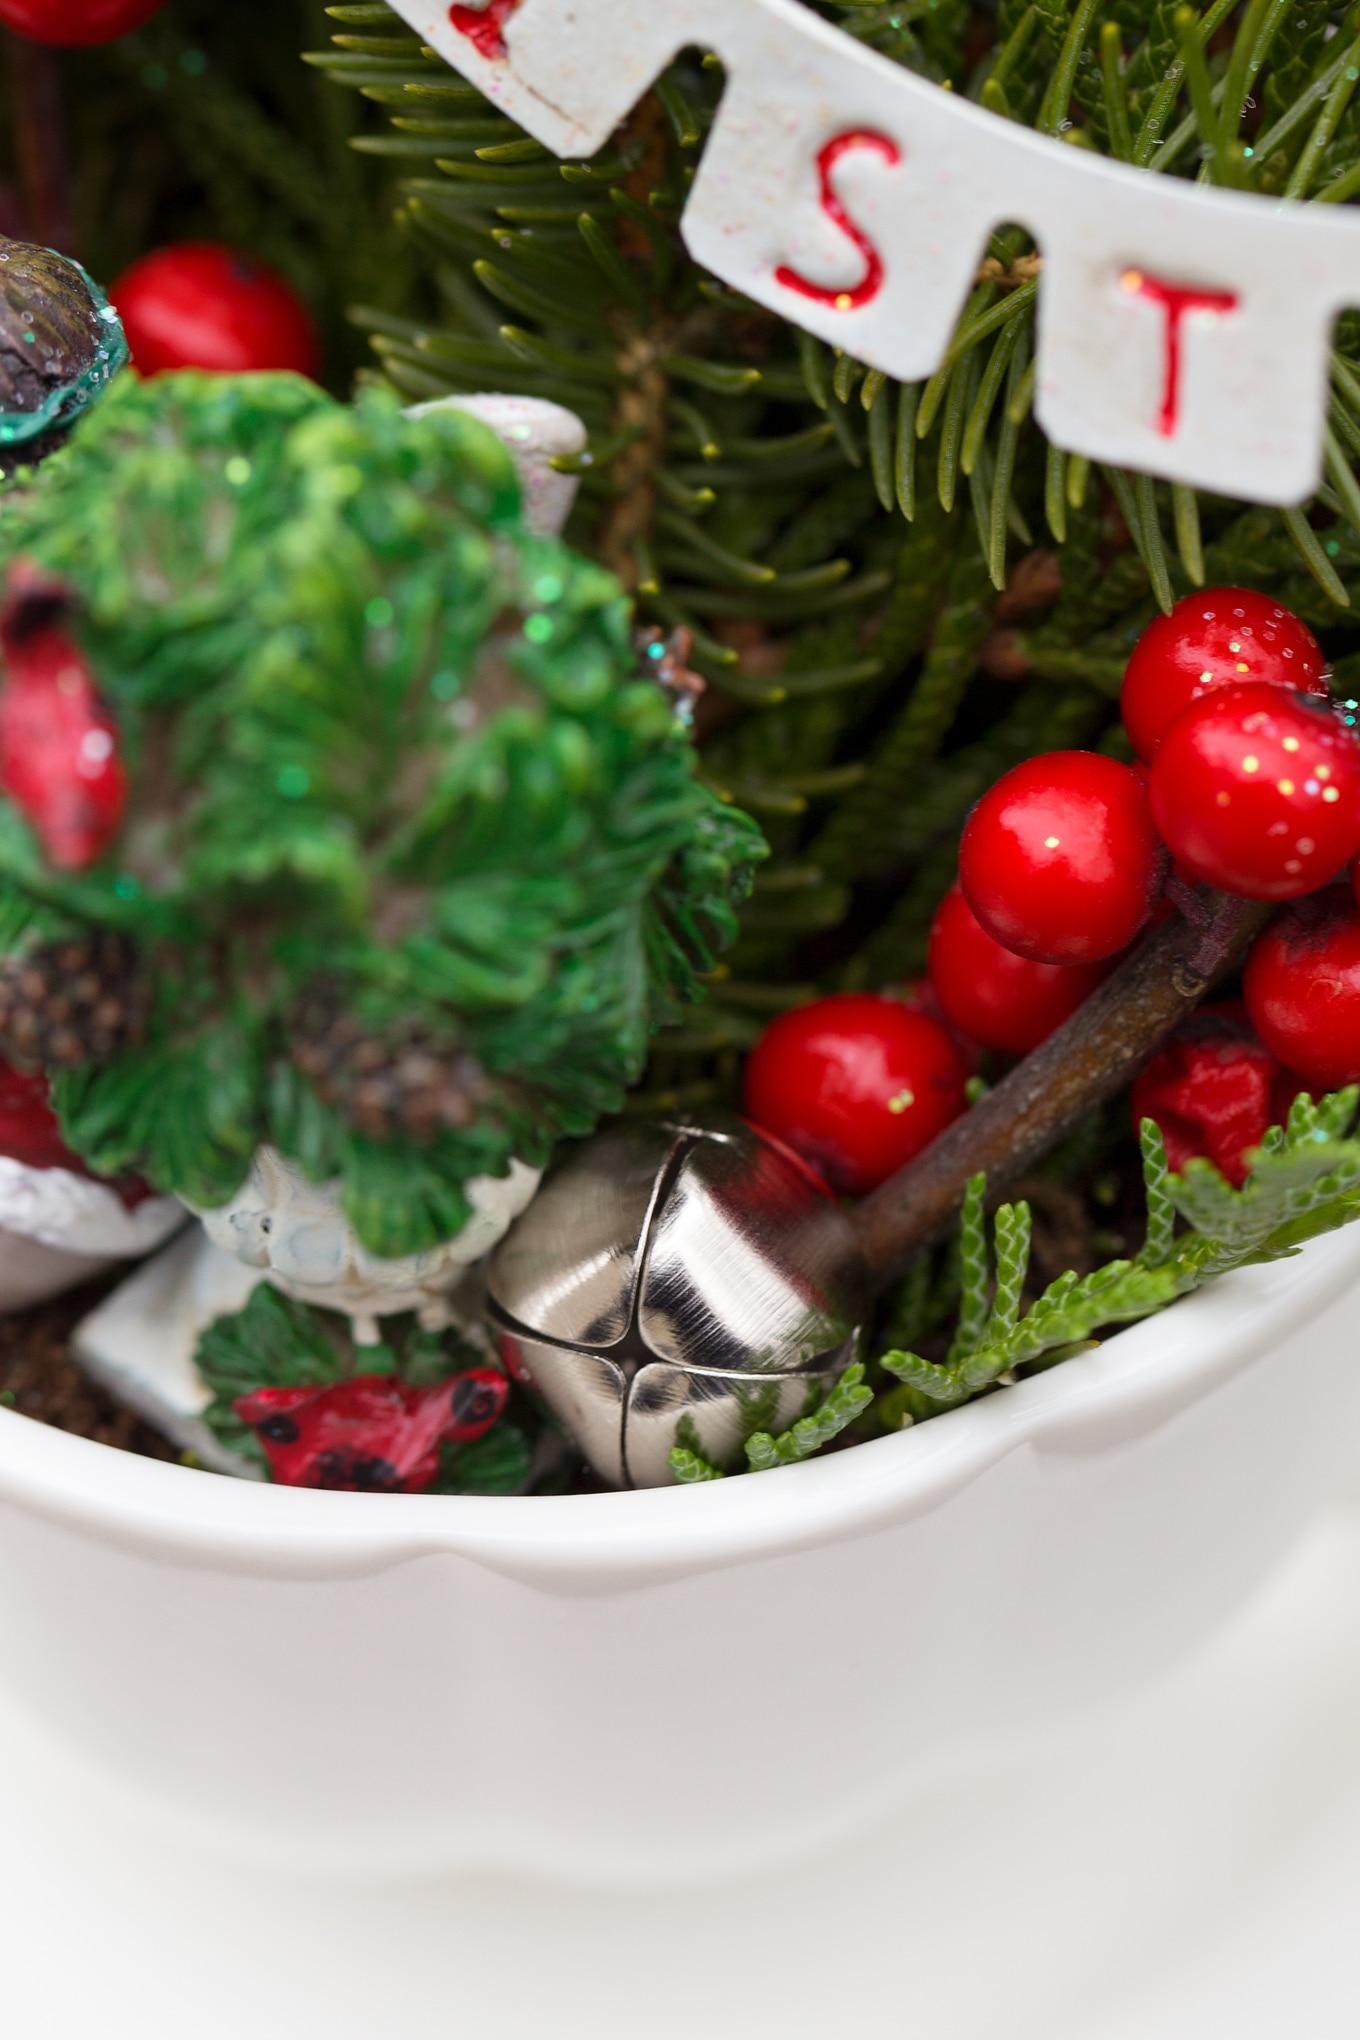 A Tiny Jingle Bell in a Christmas Teacup Garden